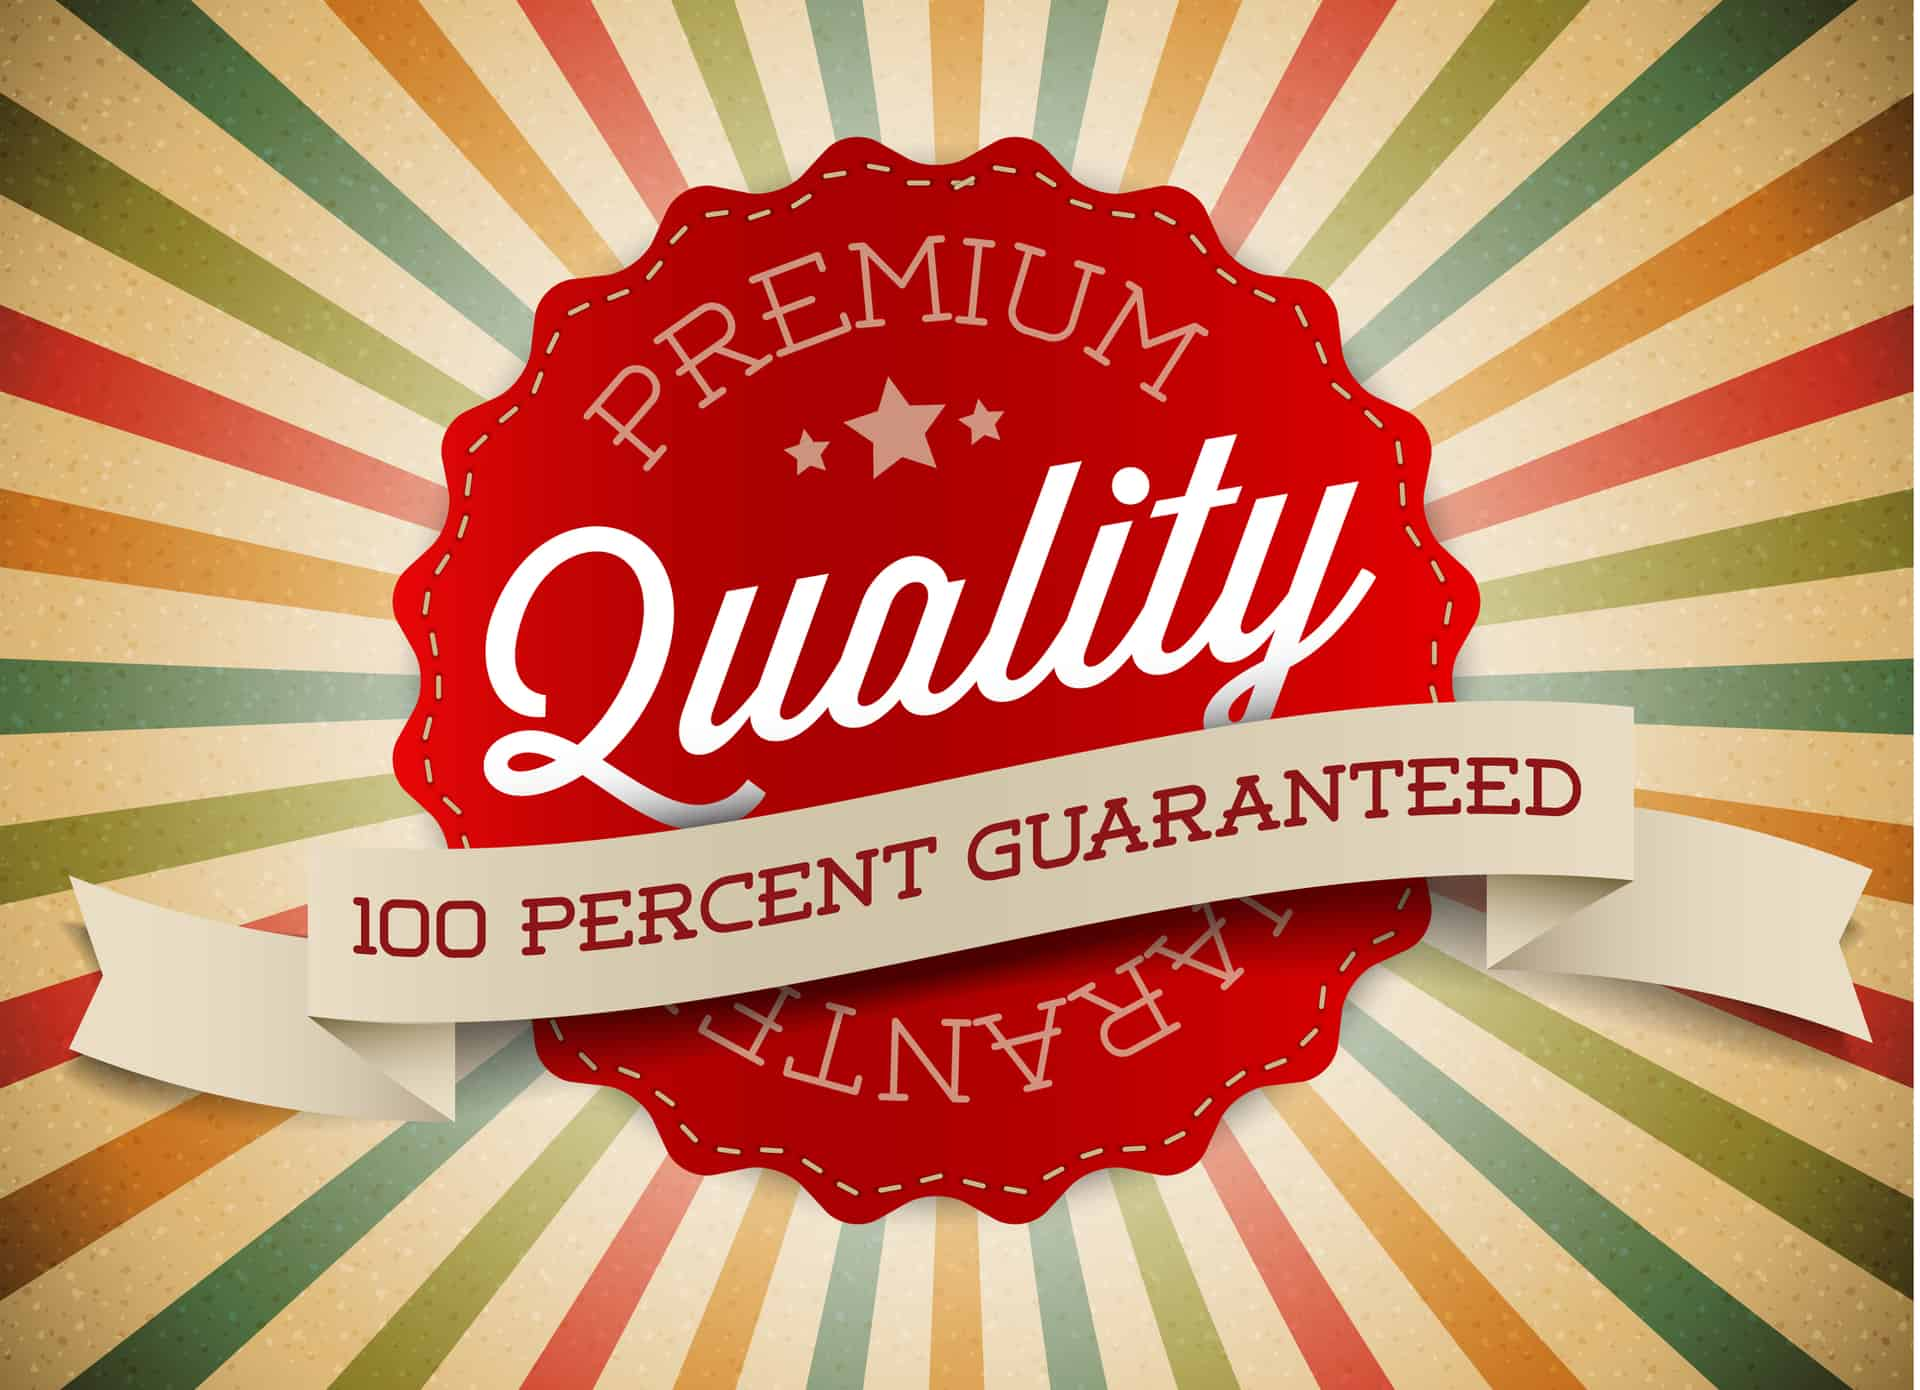 quality content copywriting services